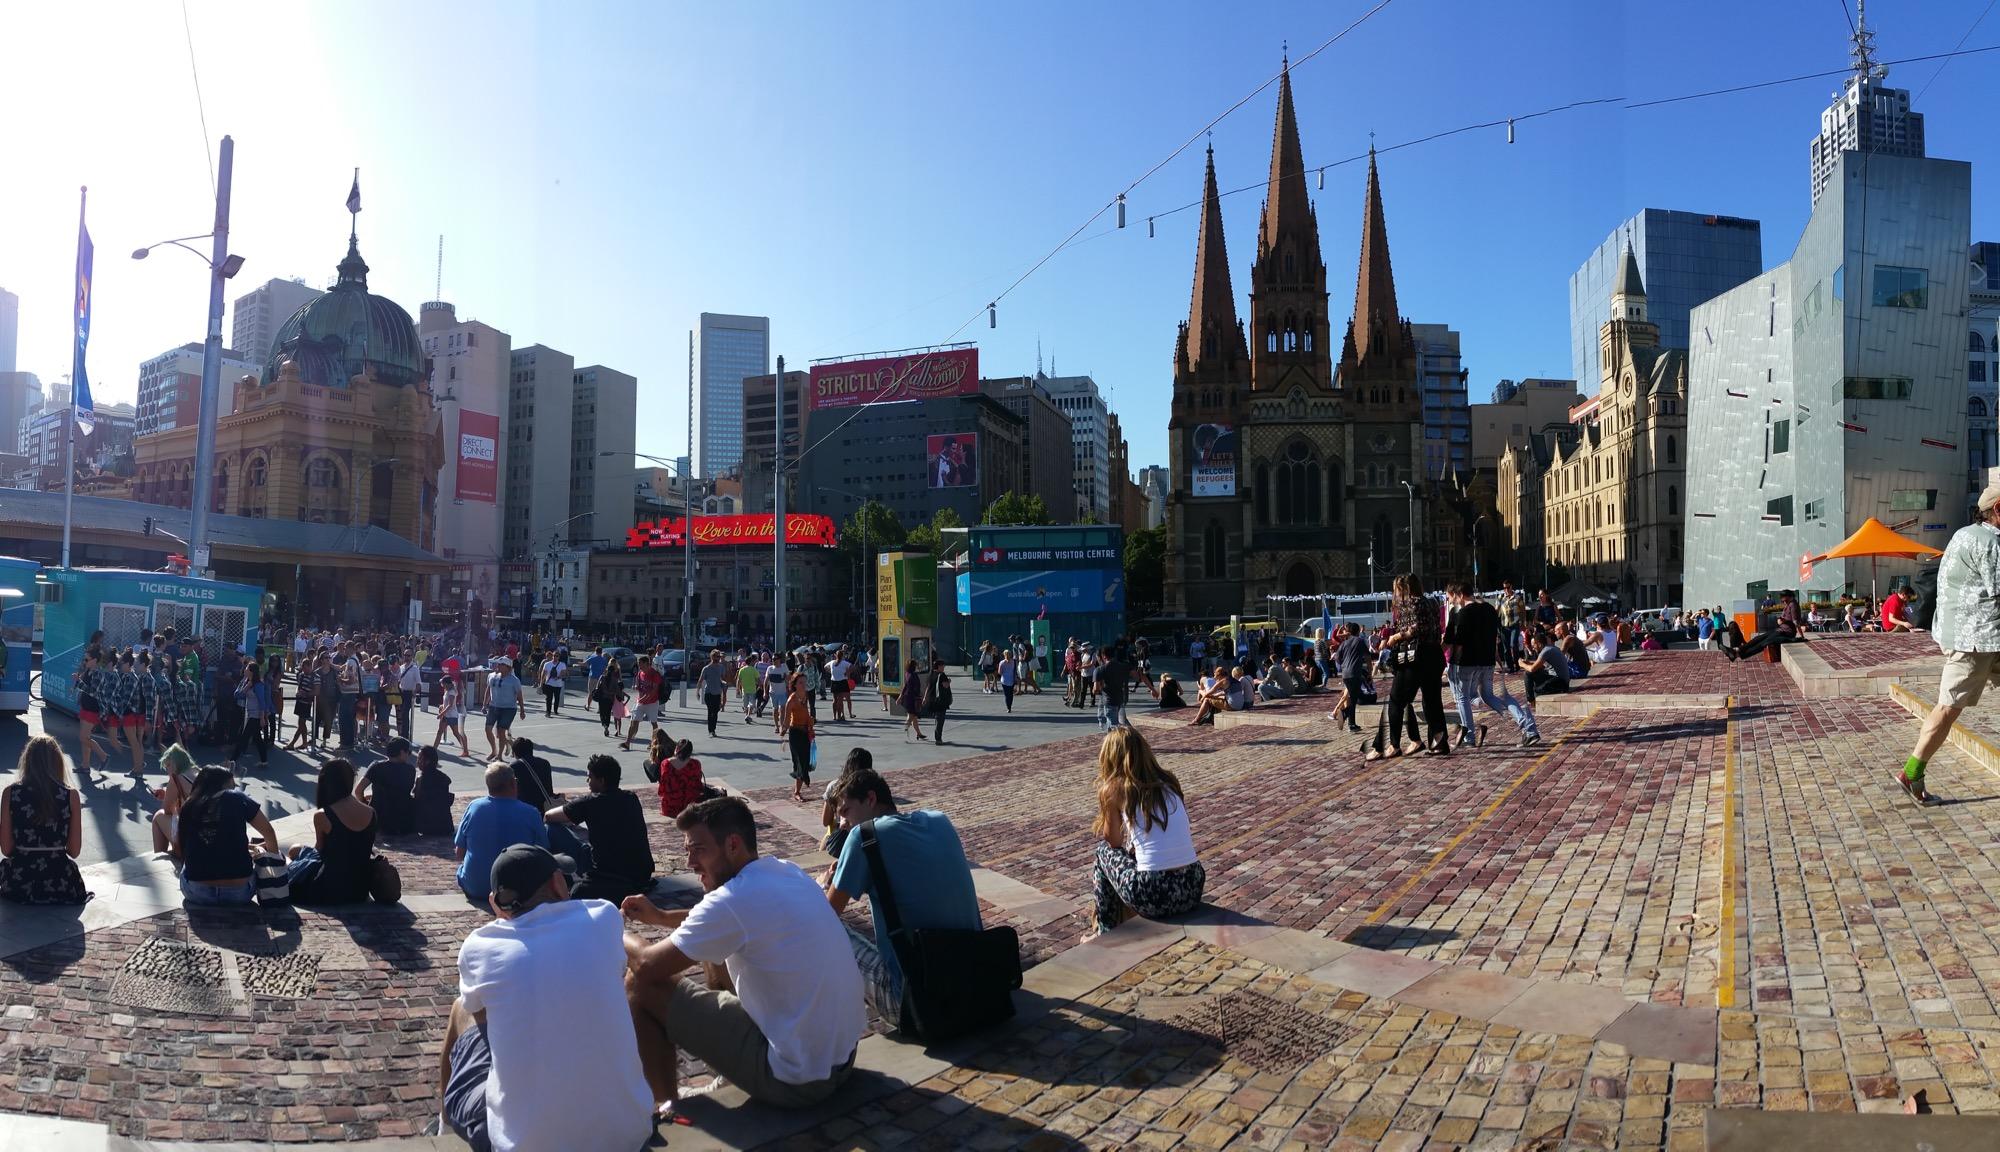 Melbourne stuff - 1 of 223 (179).jpg